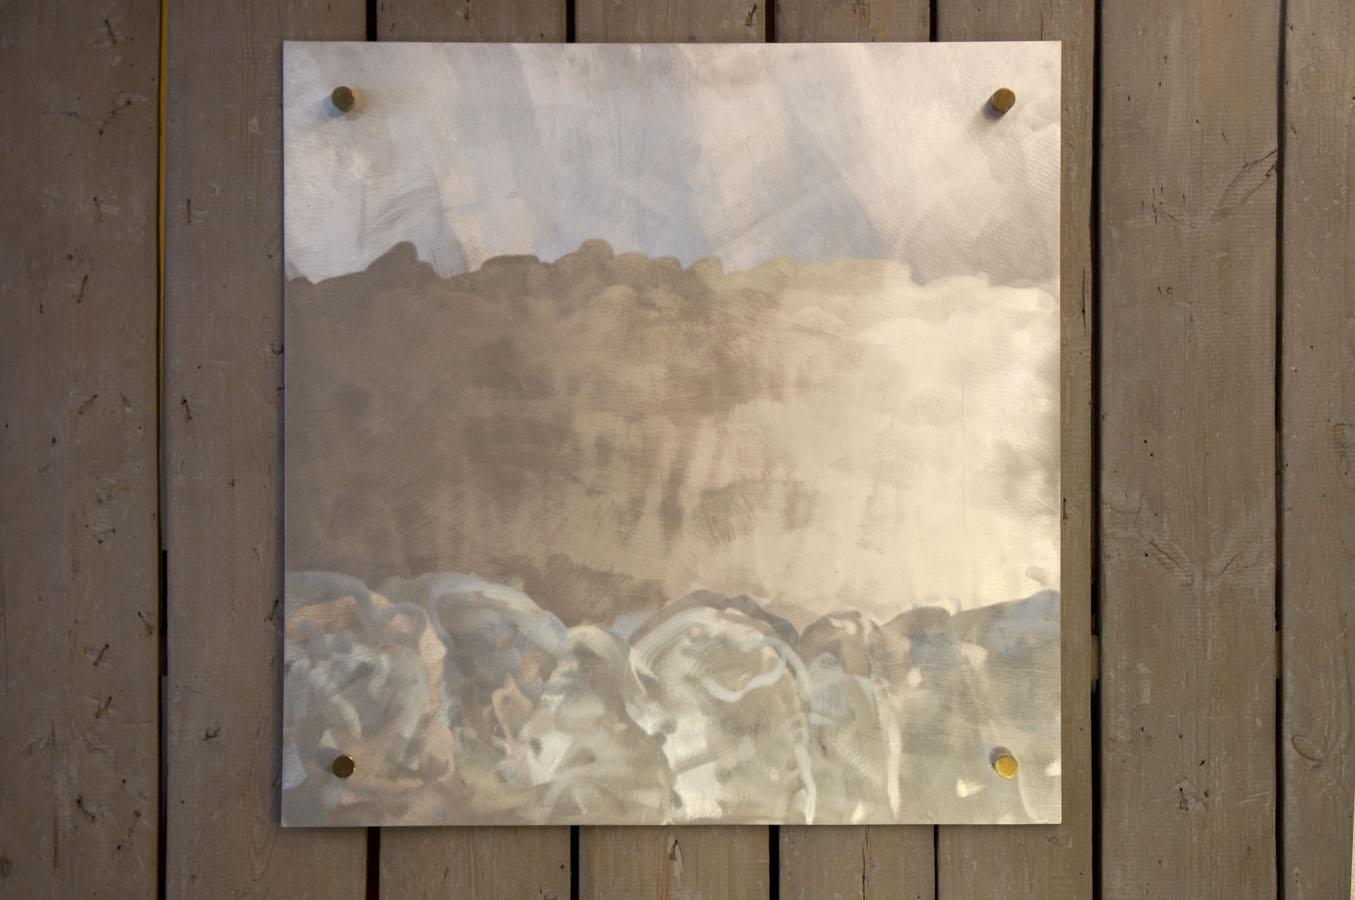 Freydenberg_Matal_Painting_2013_1.jpg